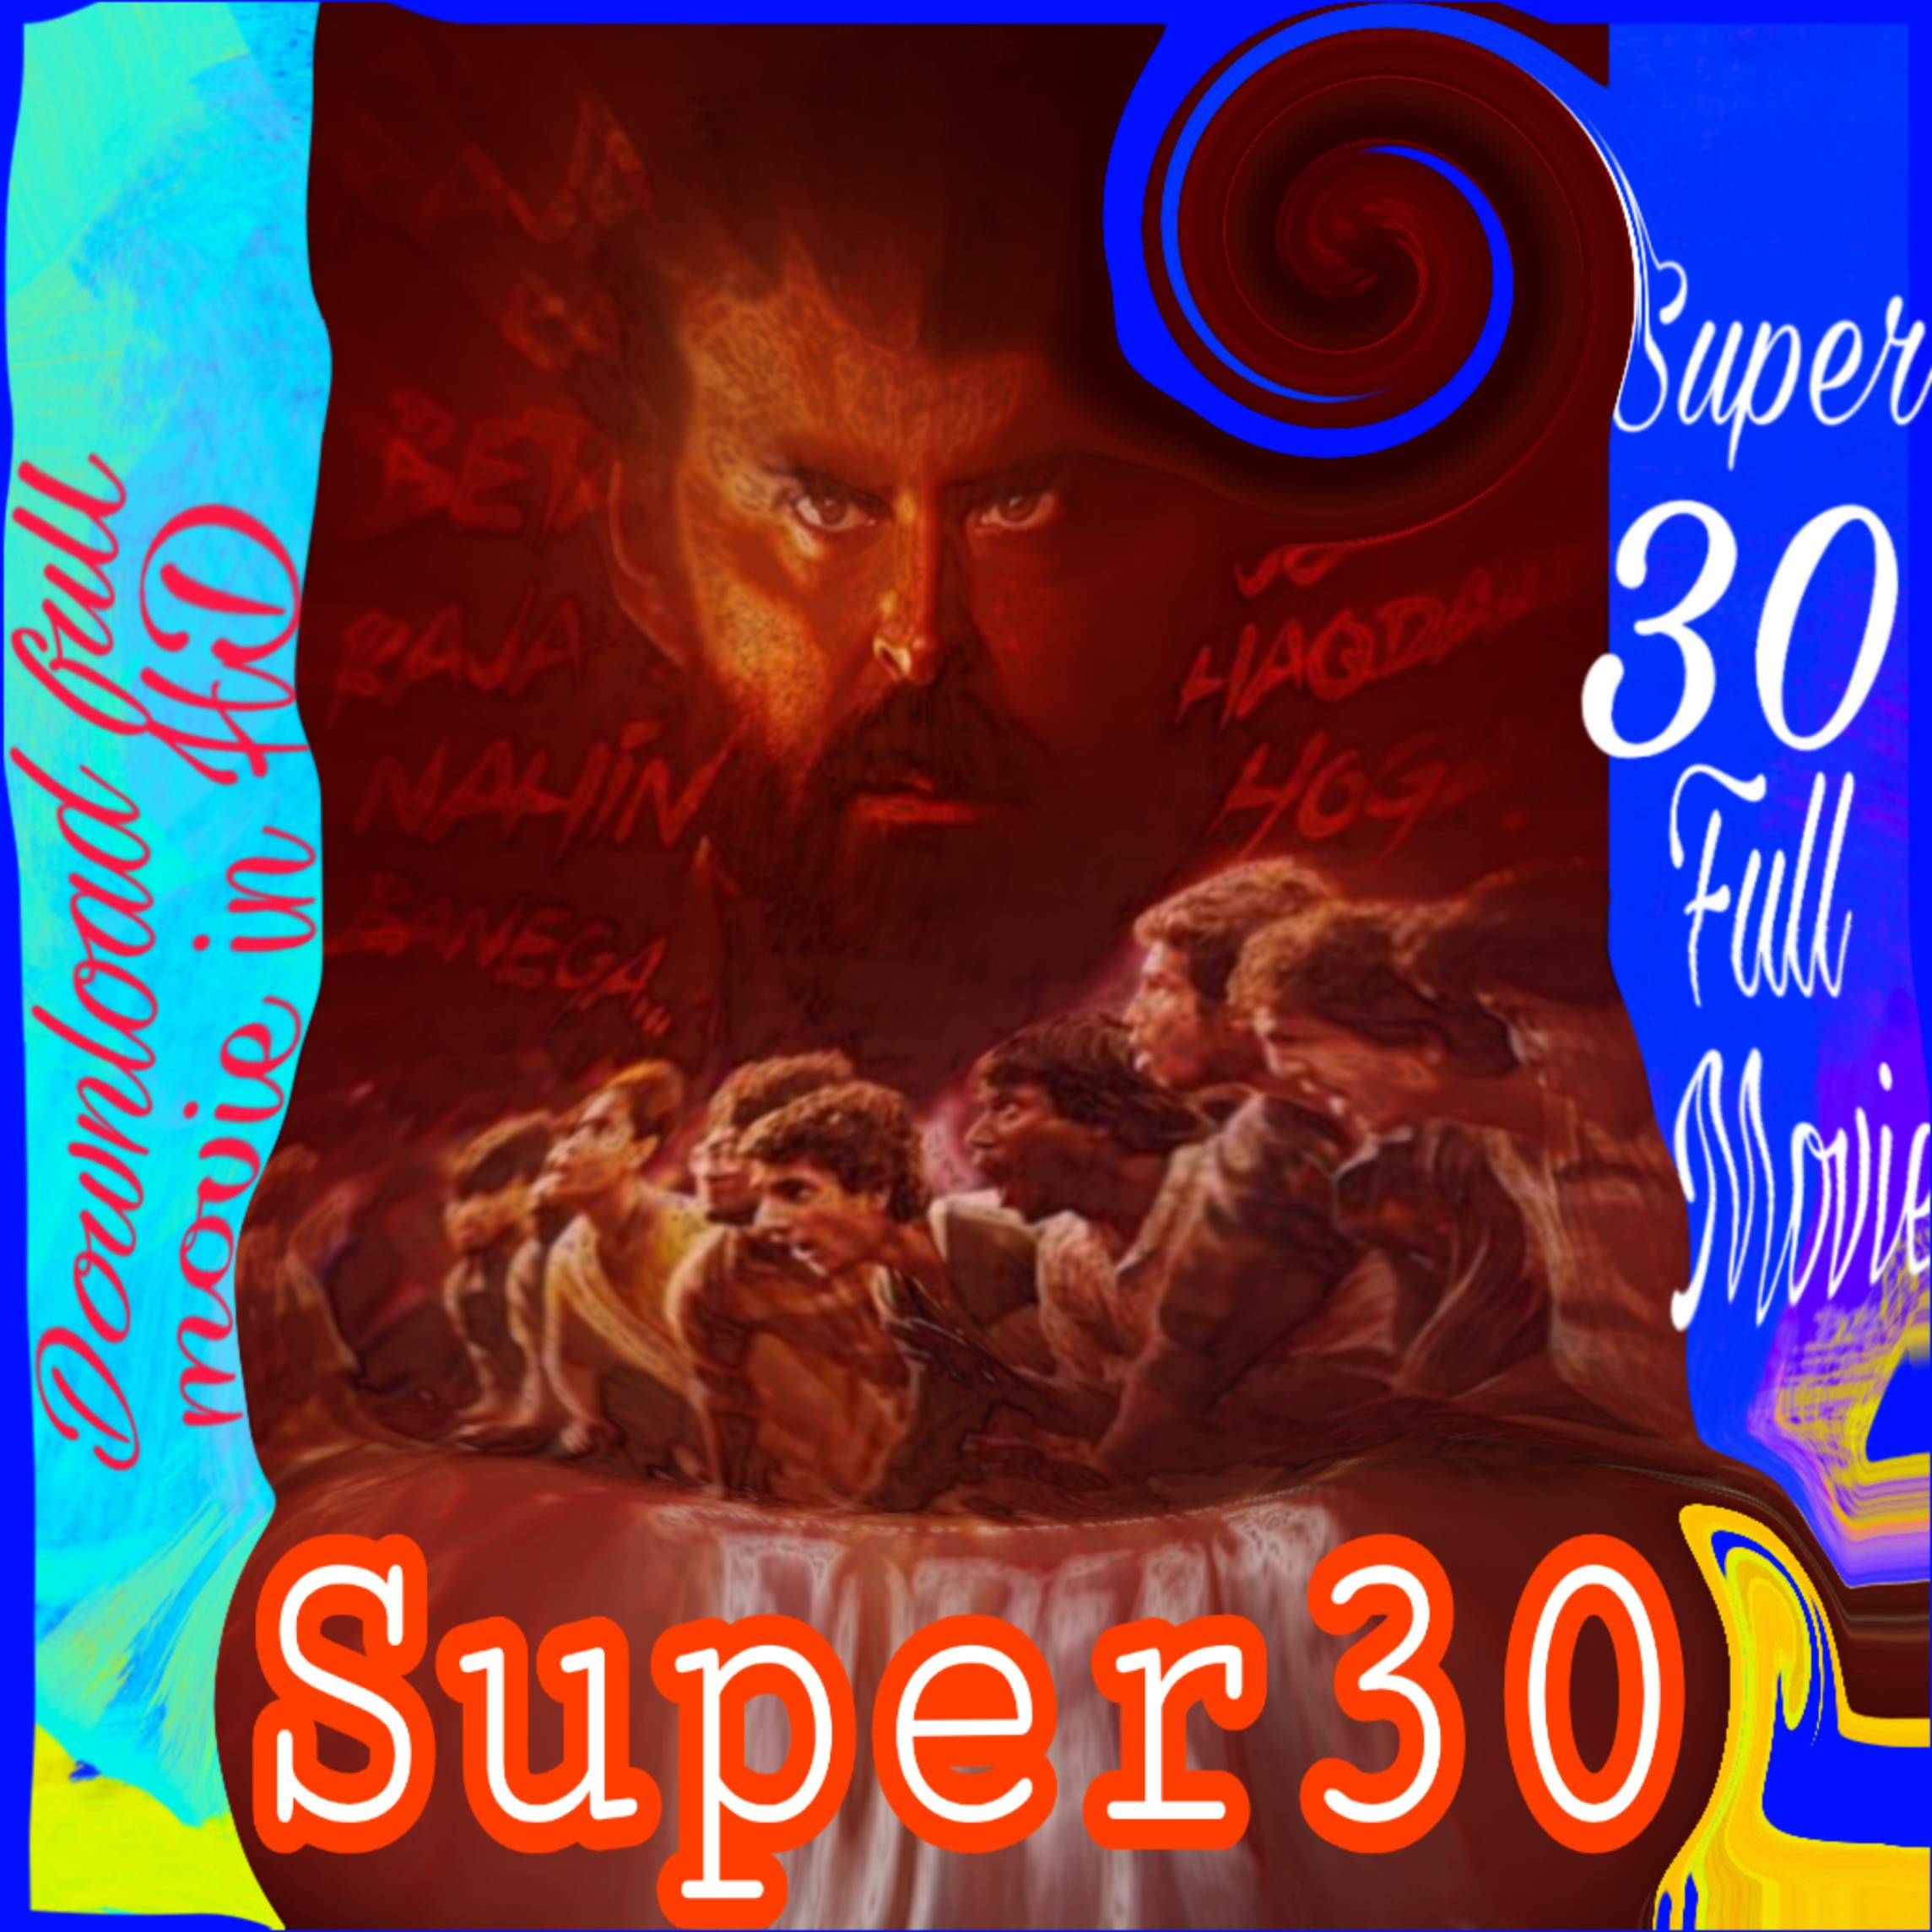 super 30 movie review, full movie download, hritik roshan